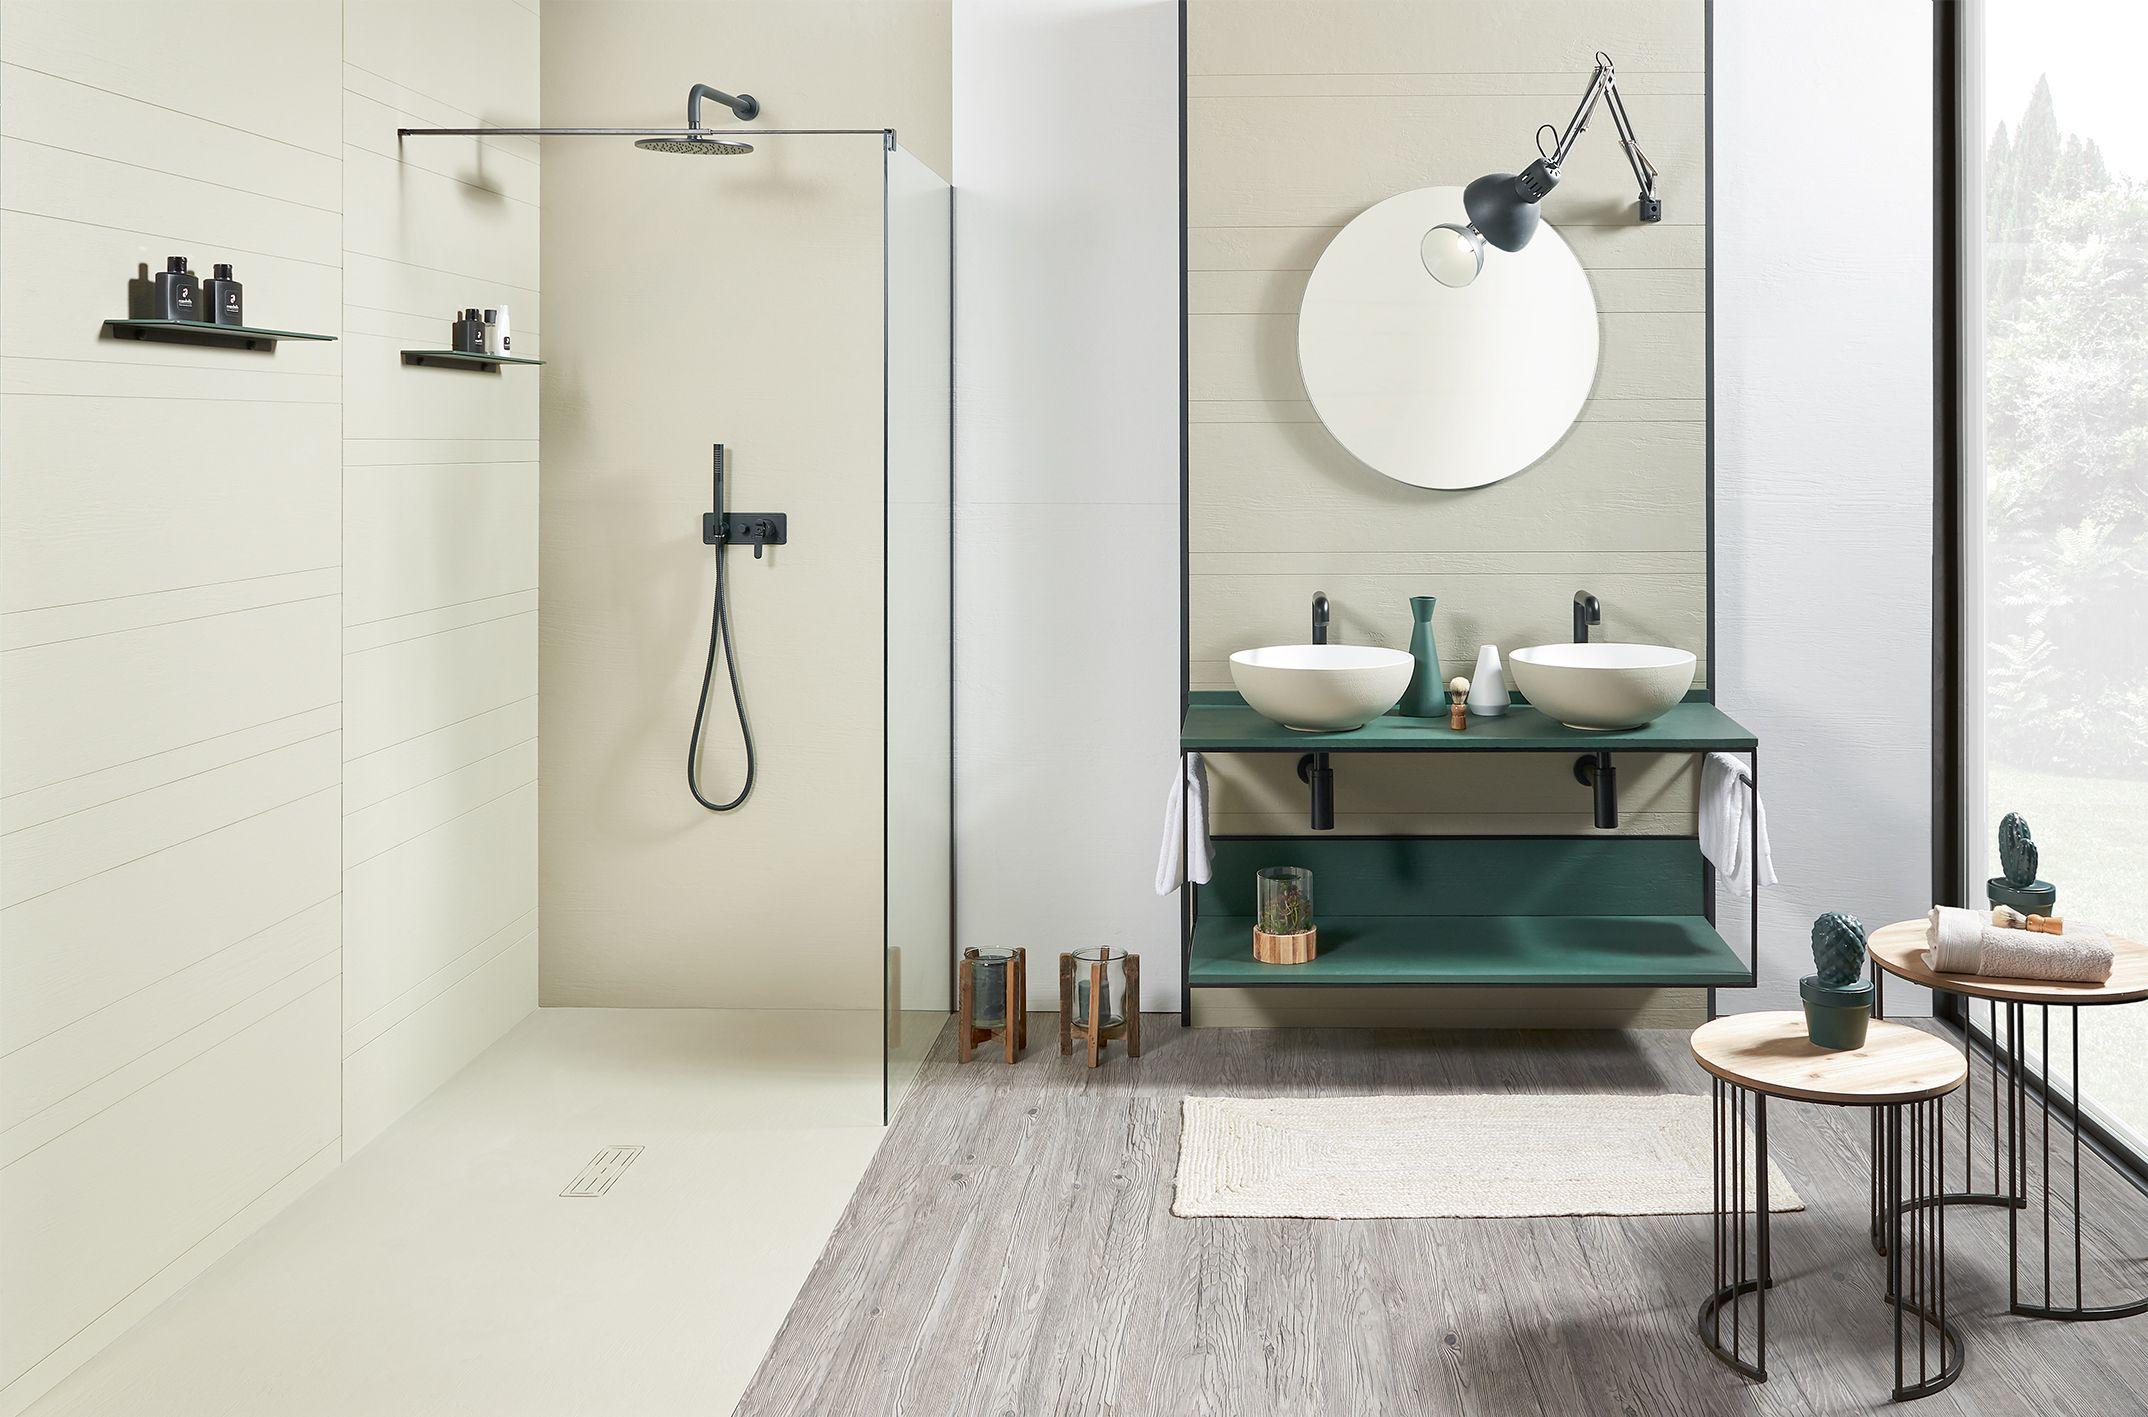 Panel Decor en 2020 | Panel de baño, Platos de ducha ...